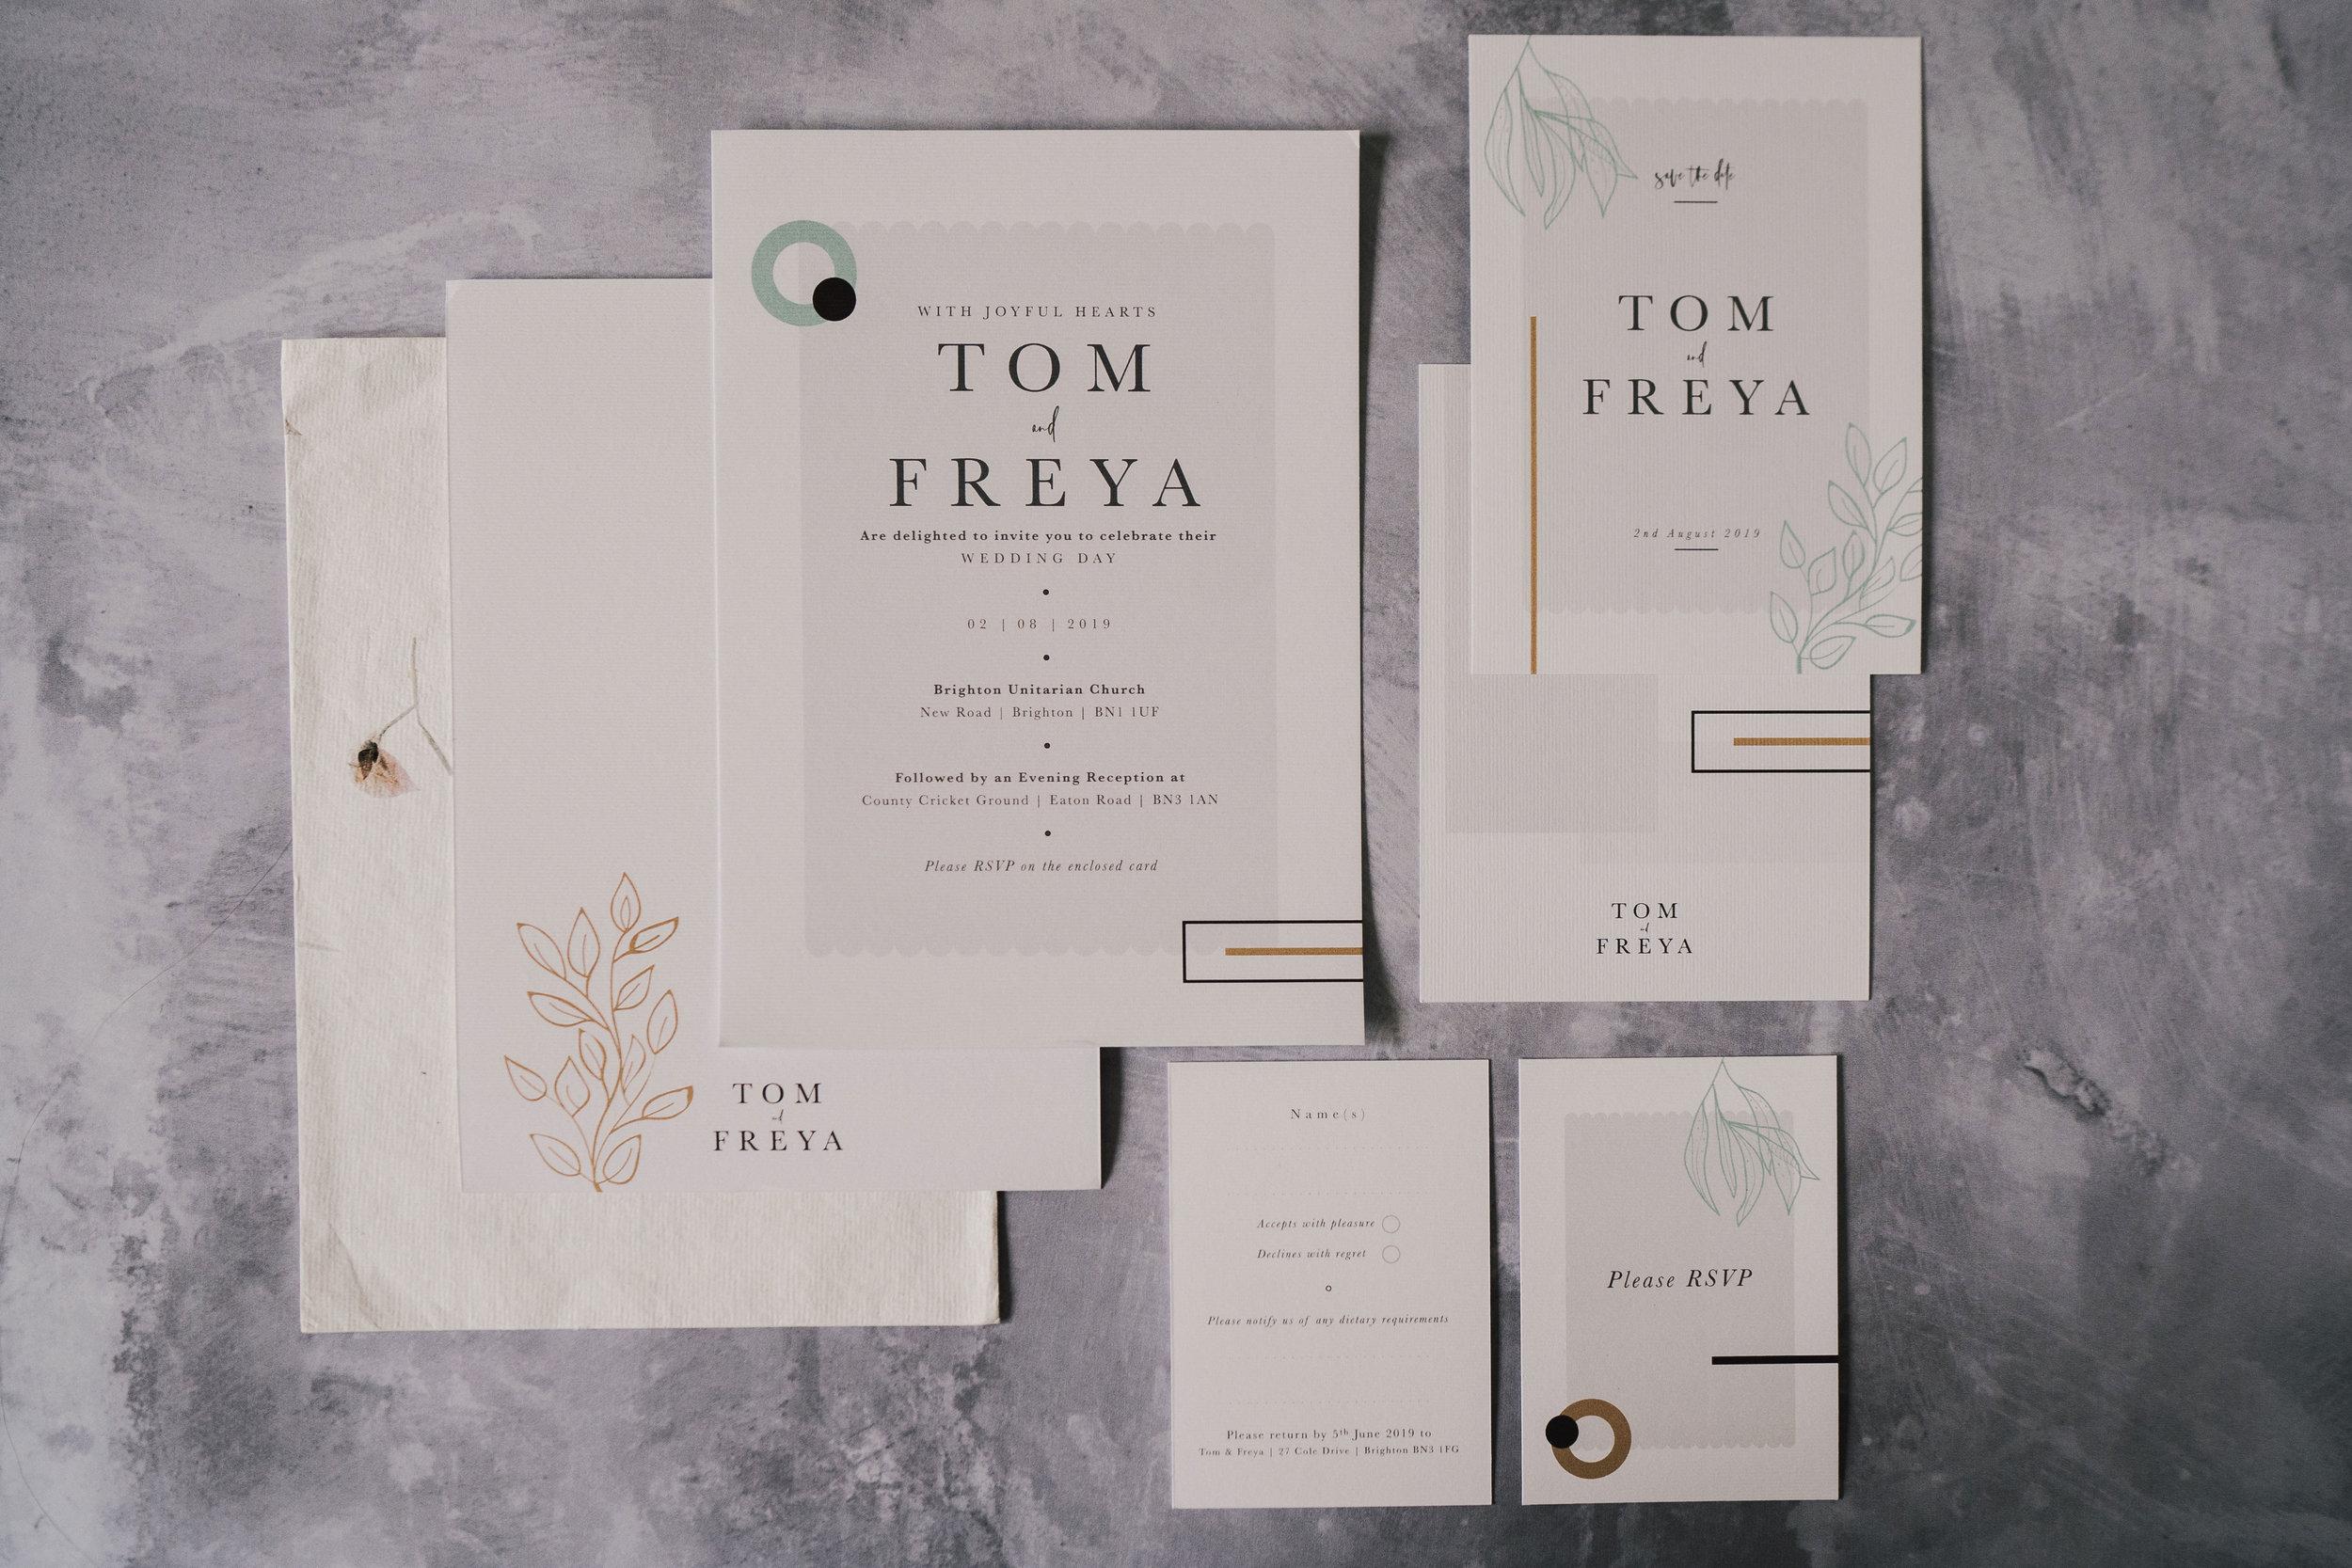 Freya_Wedding_Invitation_Template_2.jpg